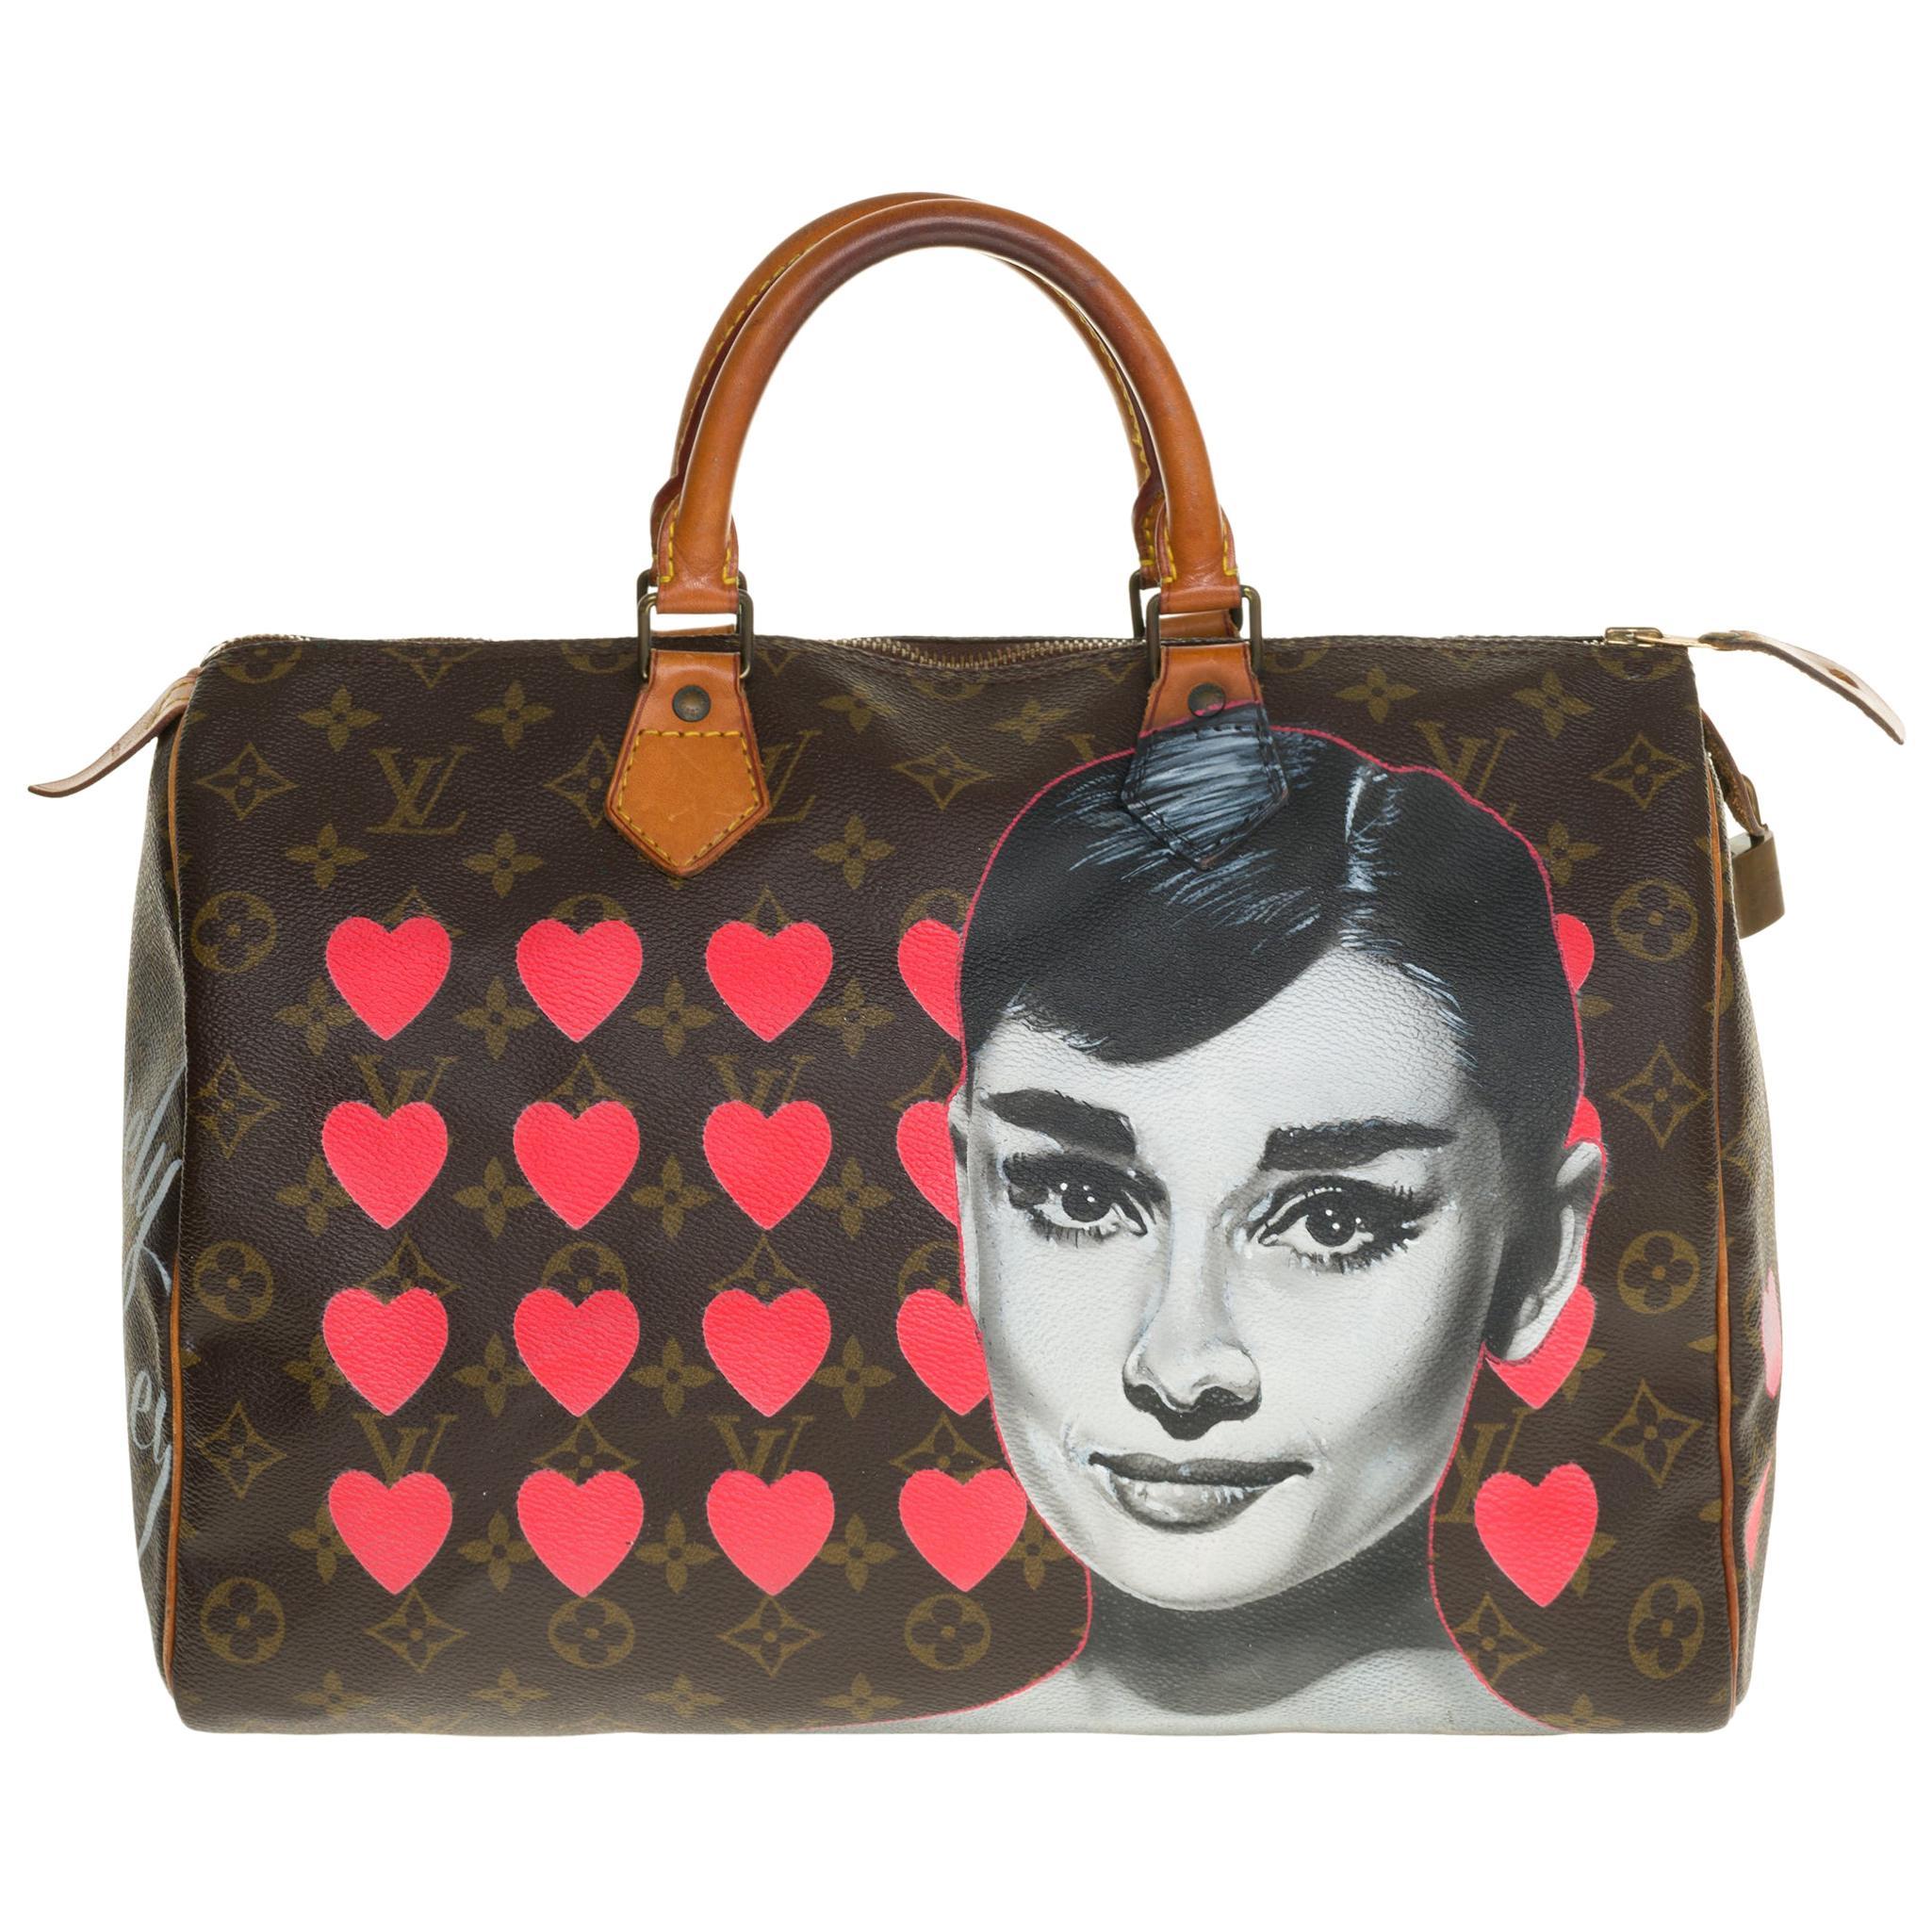 "Louis Vuitton Speedy 35 handbag in Monogram canvas customized ""Lovely Audrey """